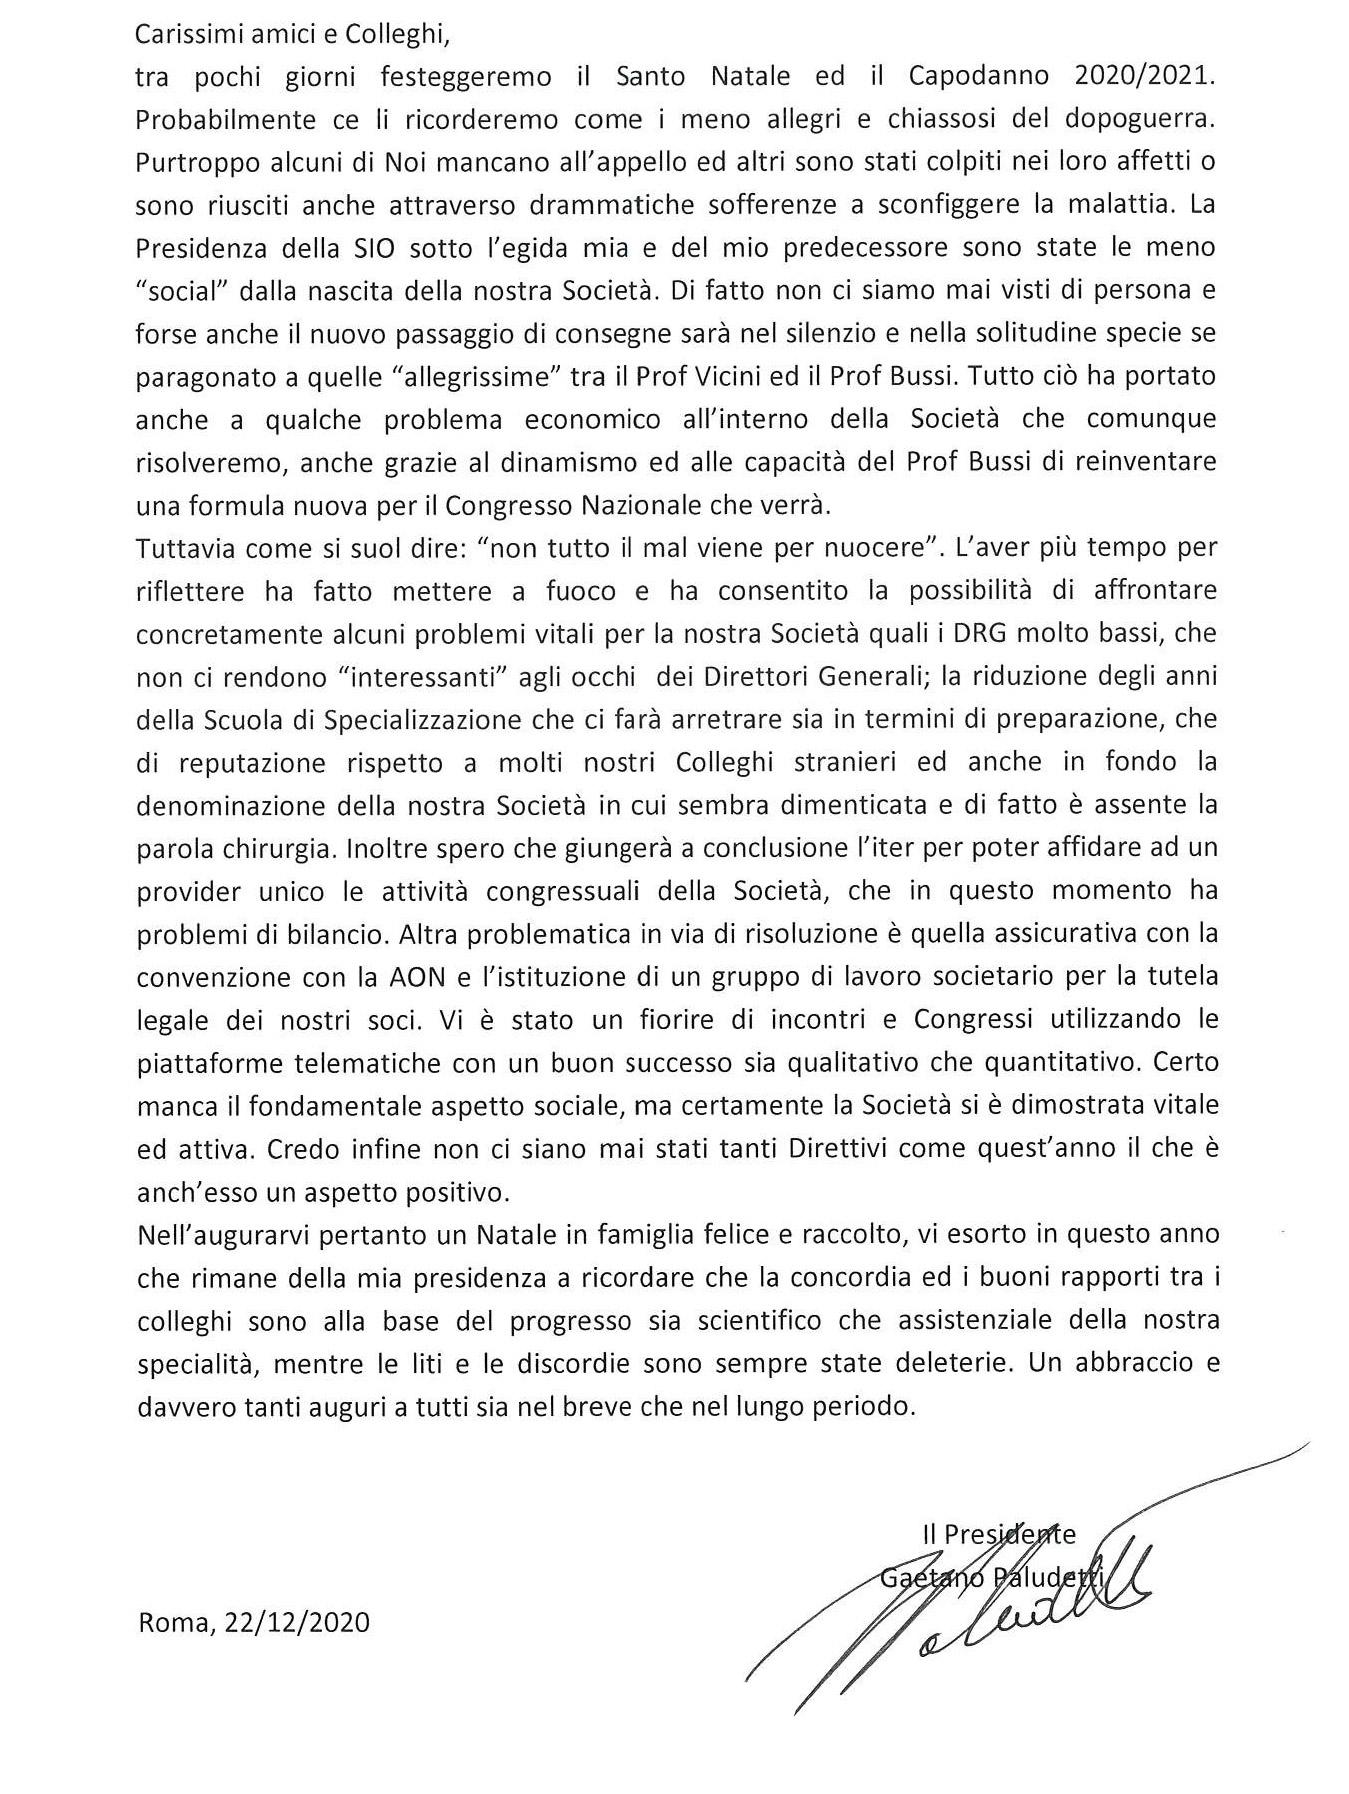 auguri-dal-presidente2020-3